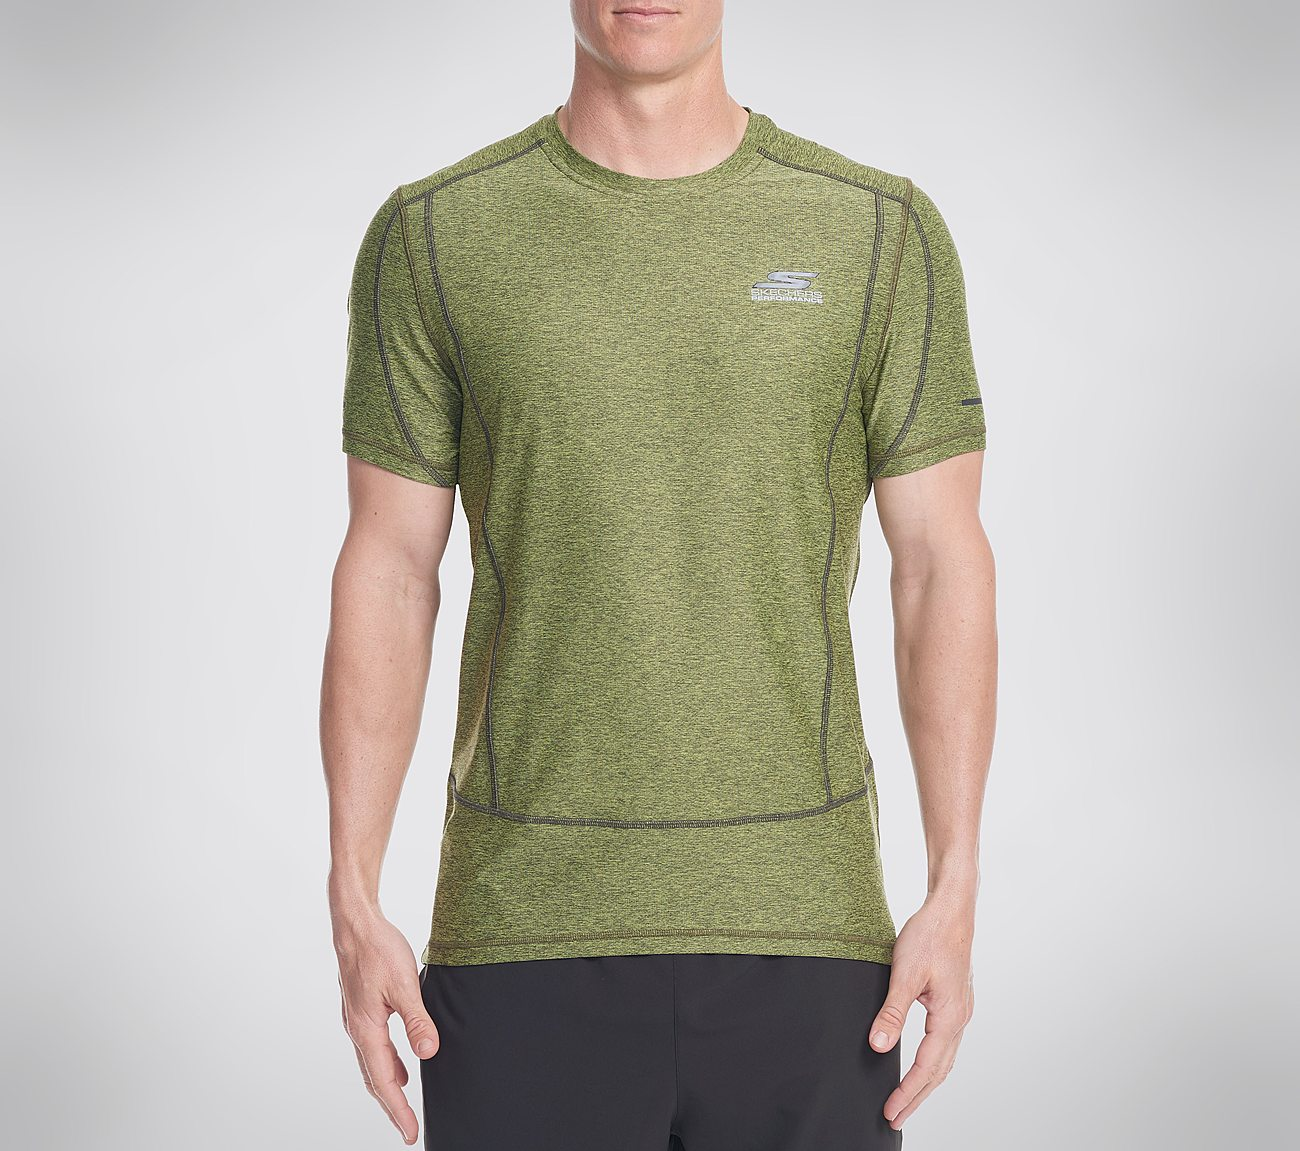 15K Short Sleeve Tee Shirt